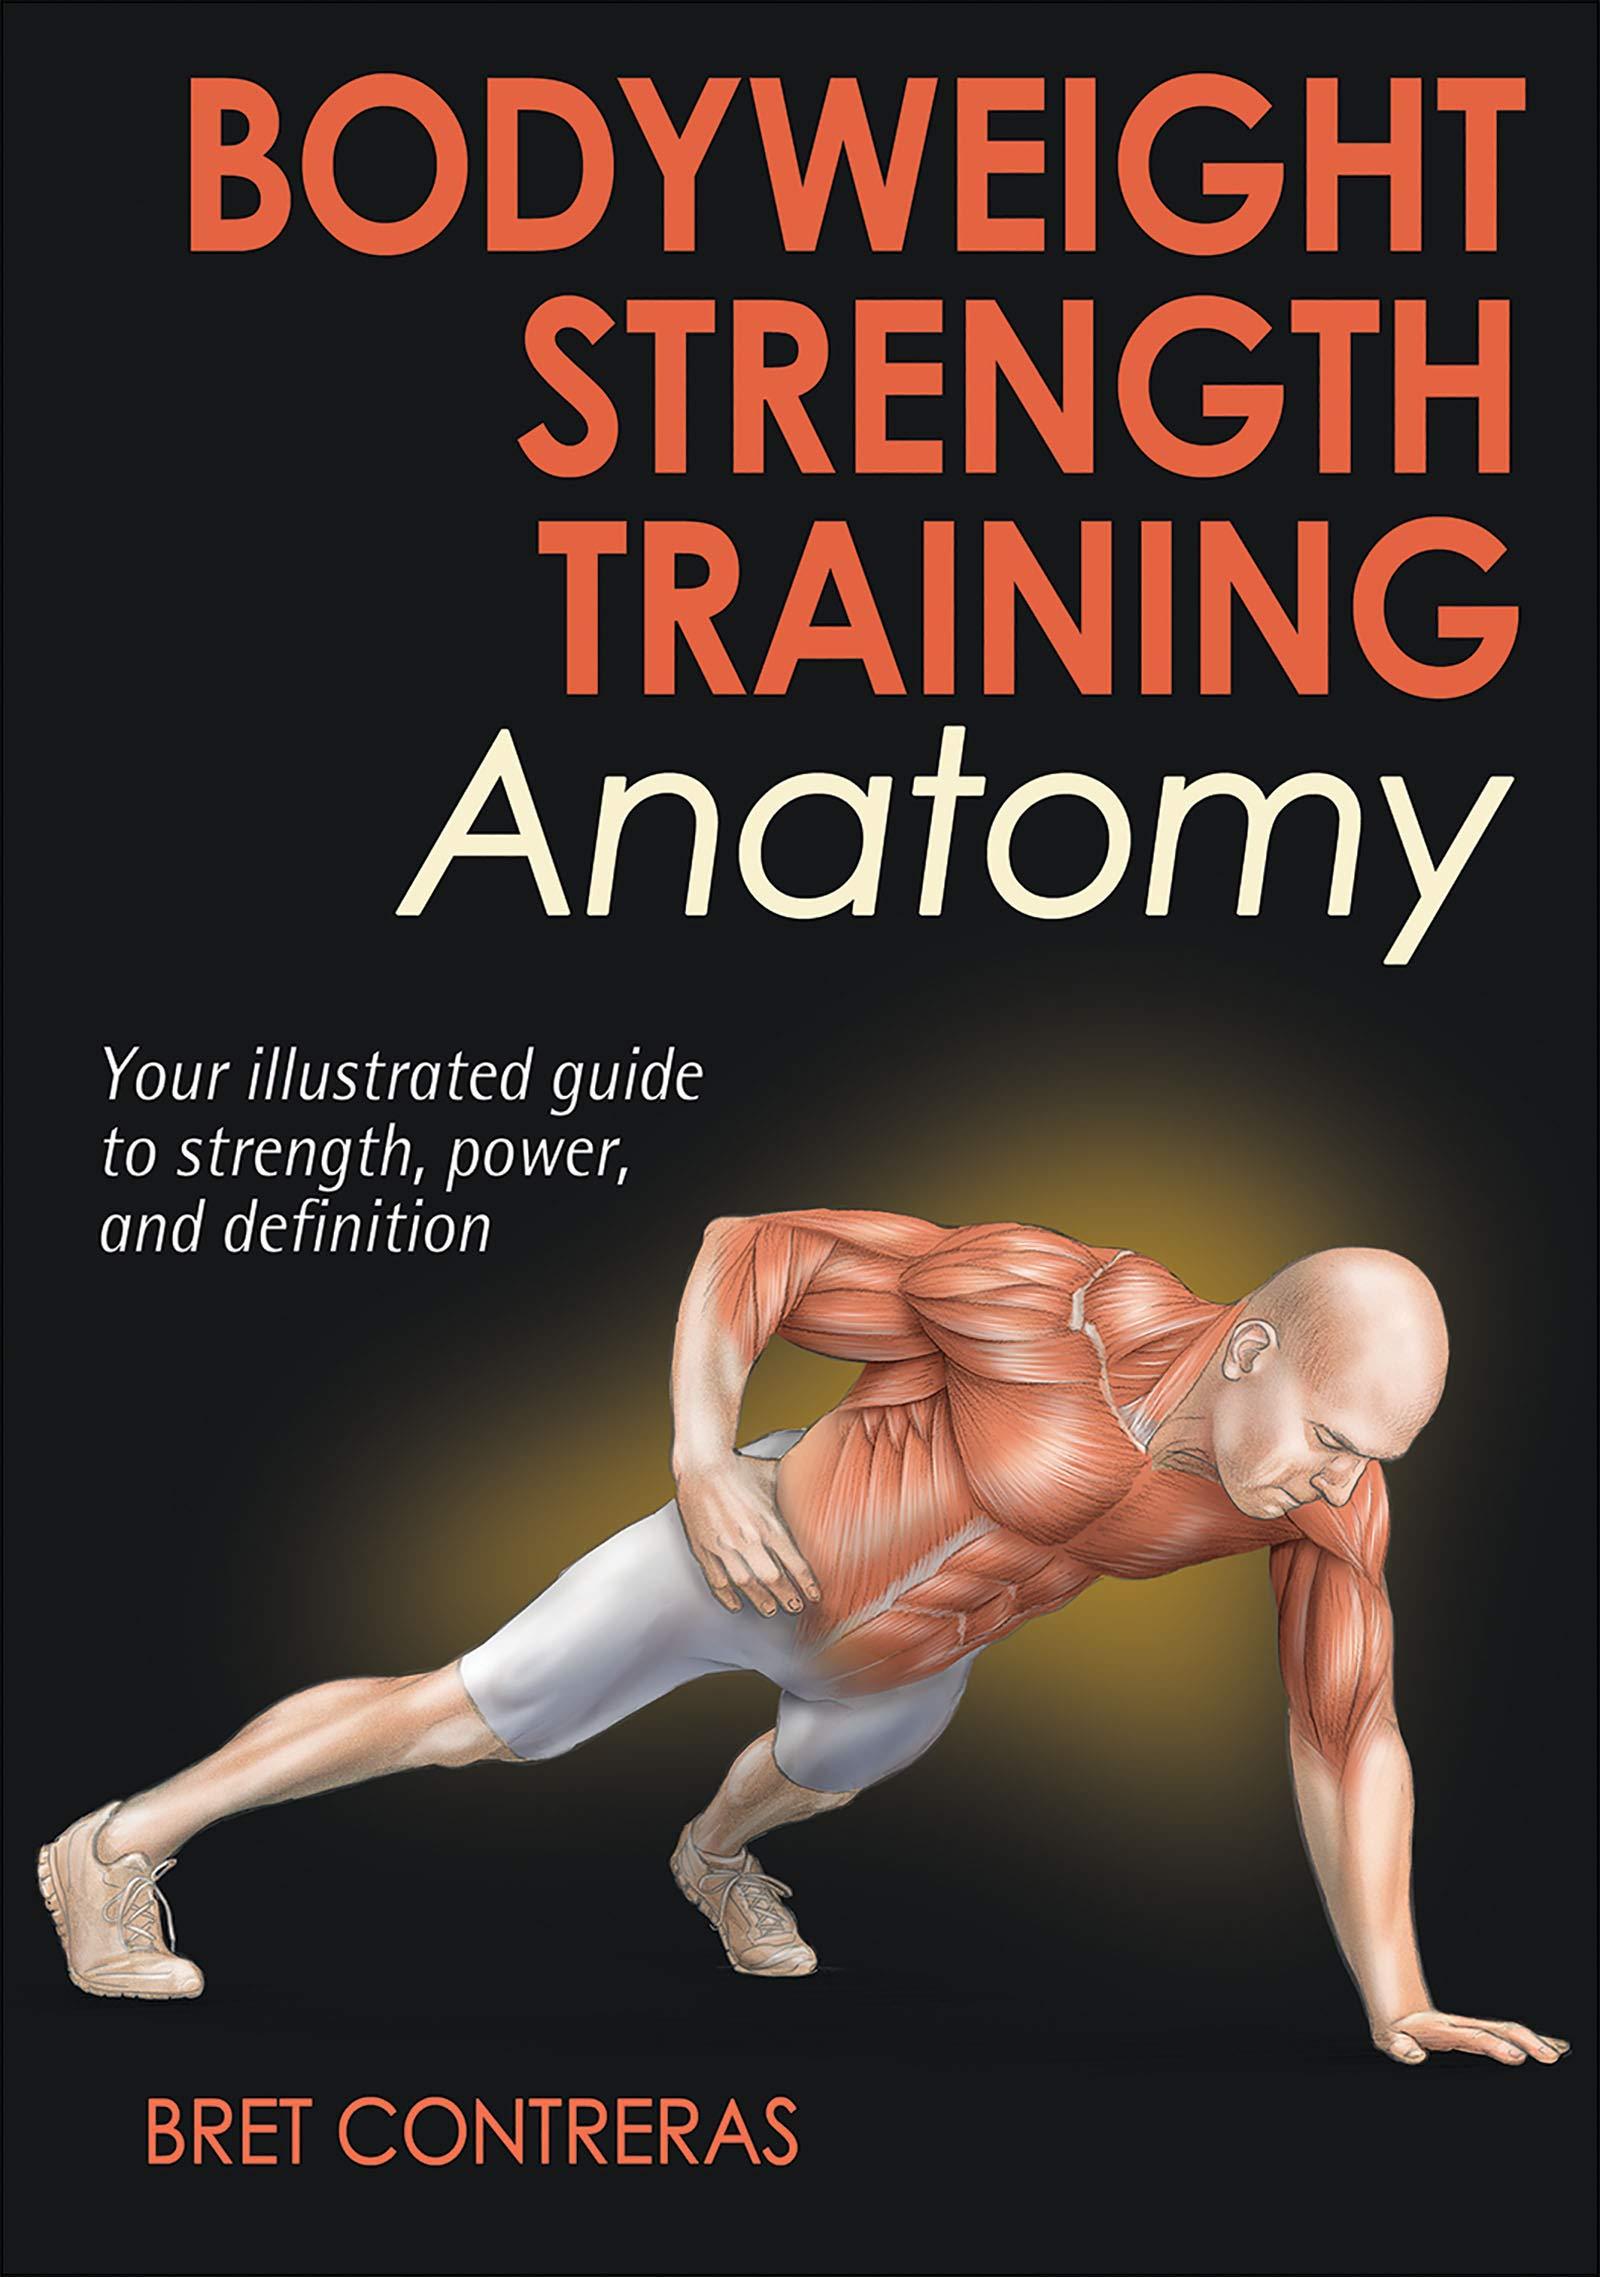 Bodyweight strength training anatomy bret contreras 8601400742761 bodyweight strength training anatomy bret contreras 8601400742761 amazon books fandeluxe Gallery